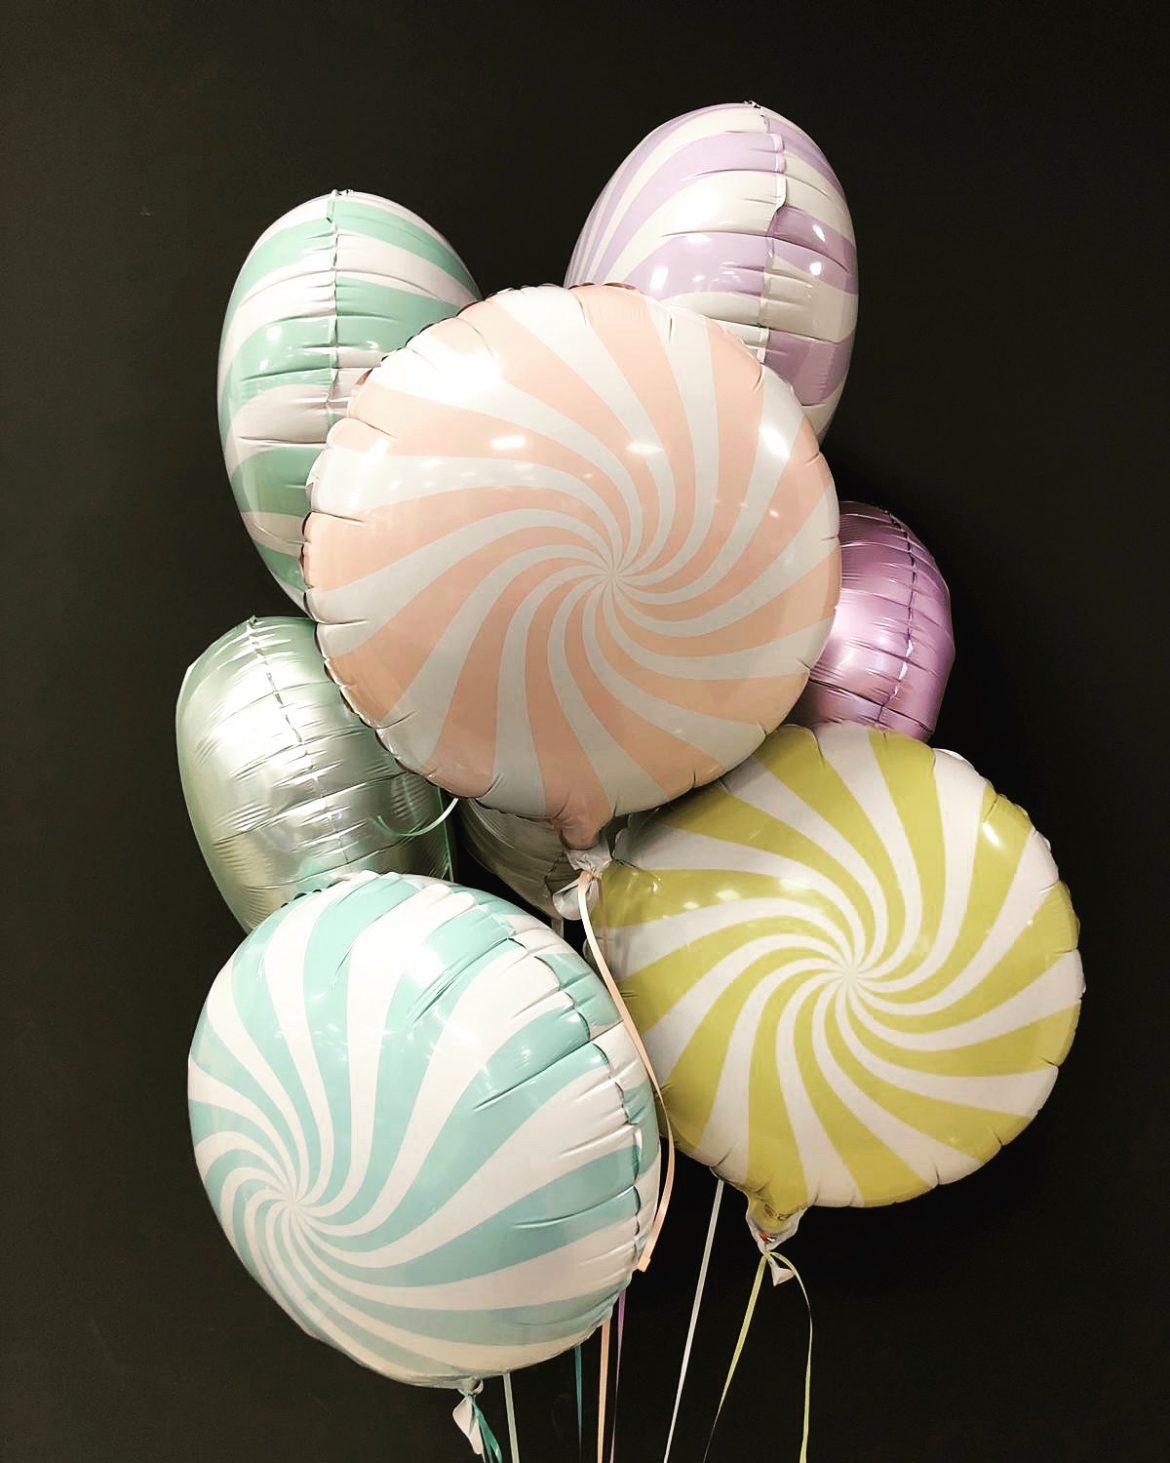 Dekorationsballons 15